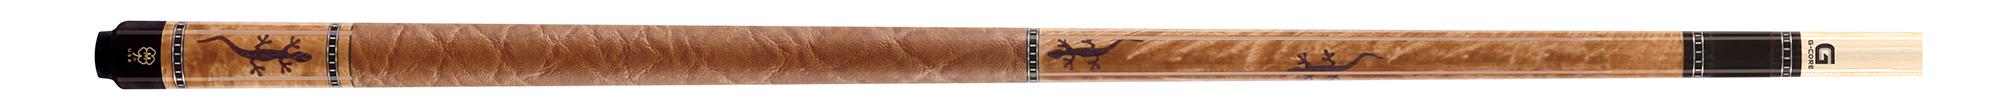 PK3053: McDermott G417 Madrone burl/inlay pool #1